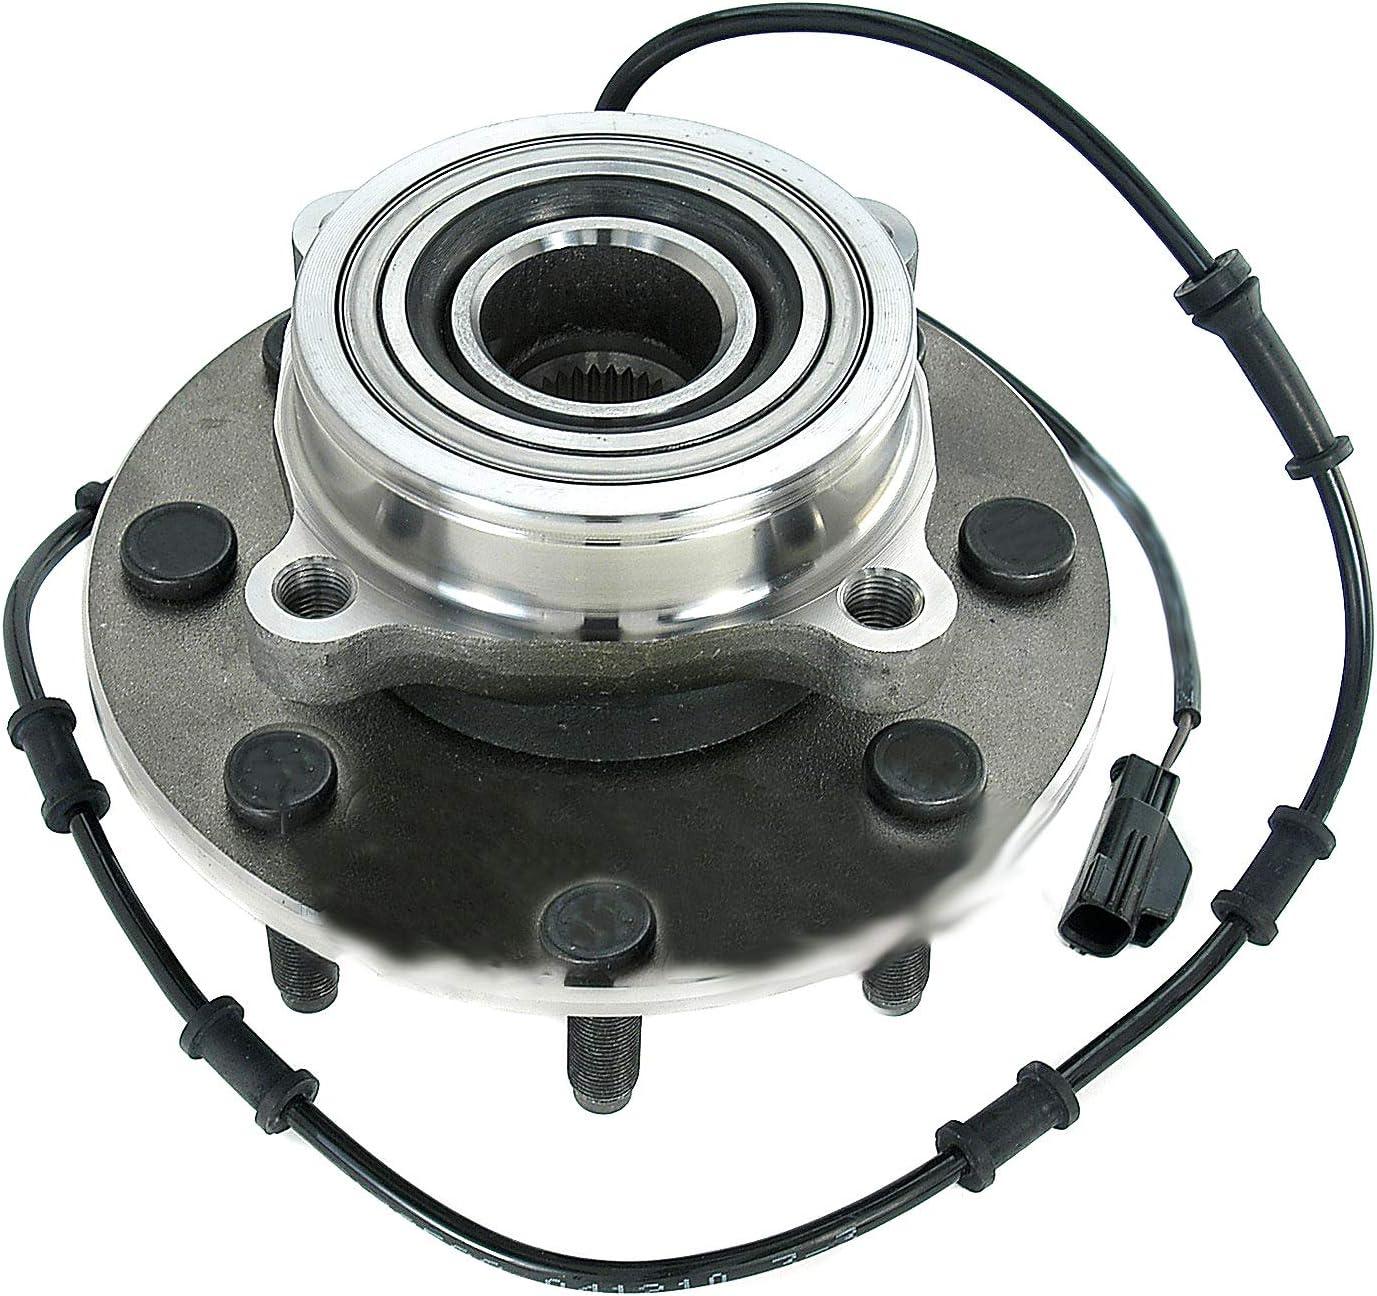 Timken LM29700LA-902A1 Multi Purpose Wheel Bearing